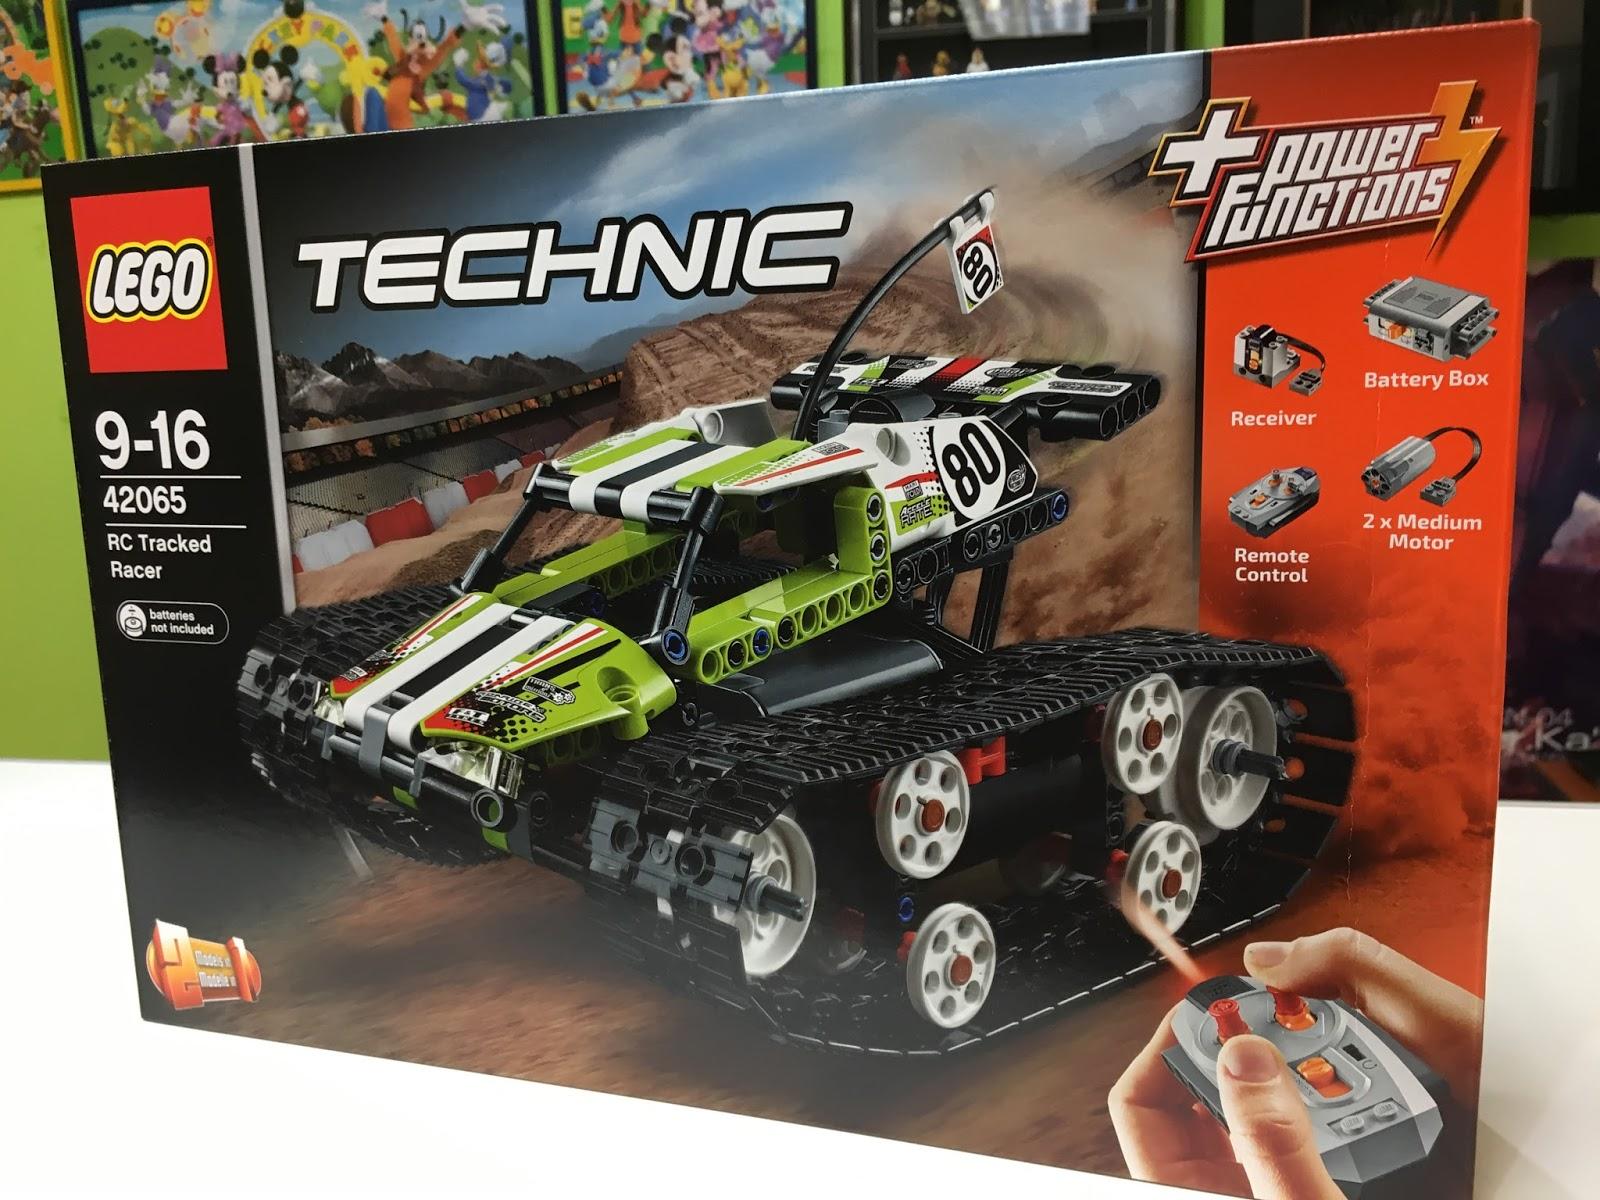 Lego technic all sets / 8 inch flat screen tv